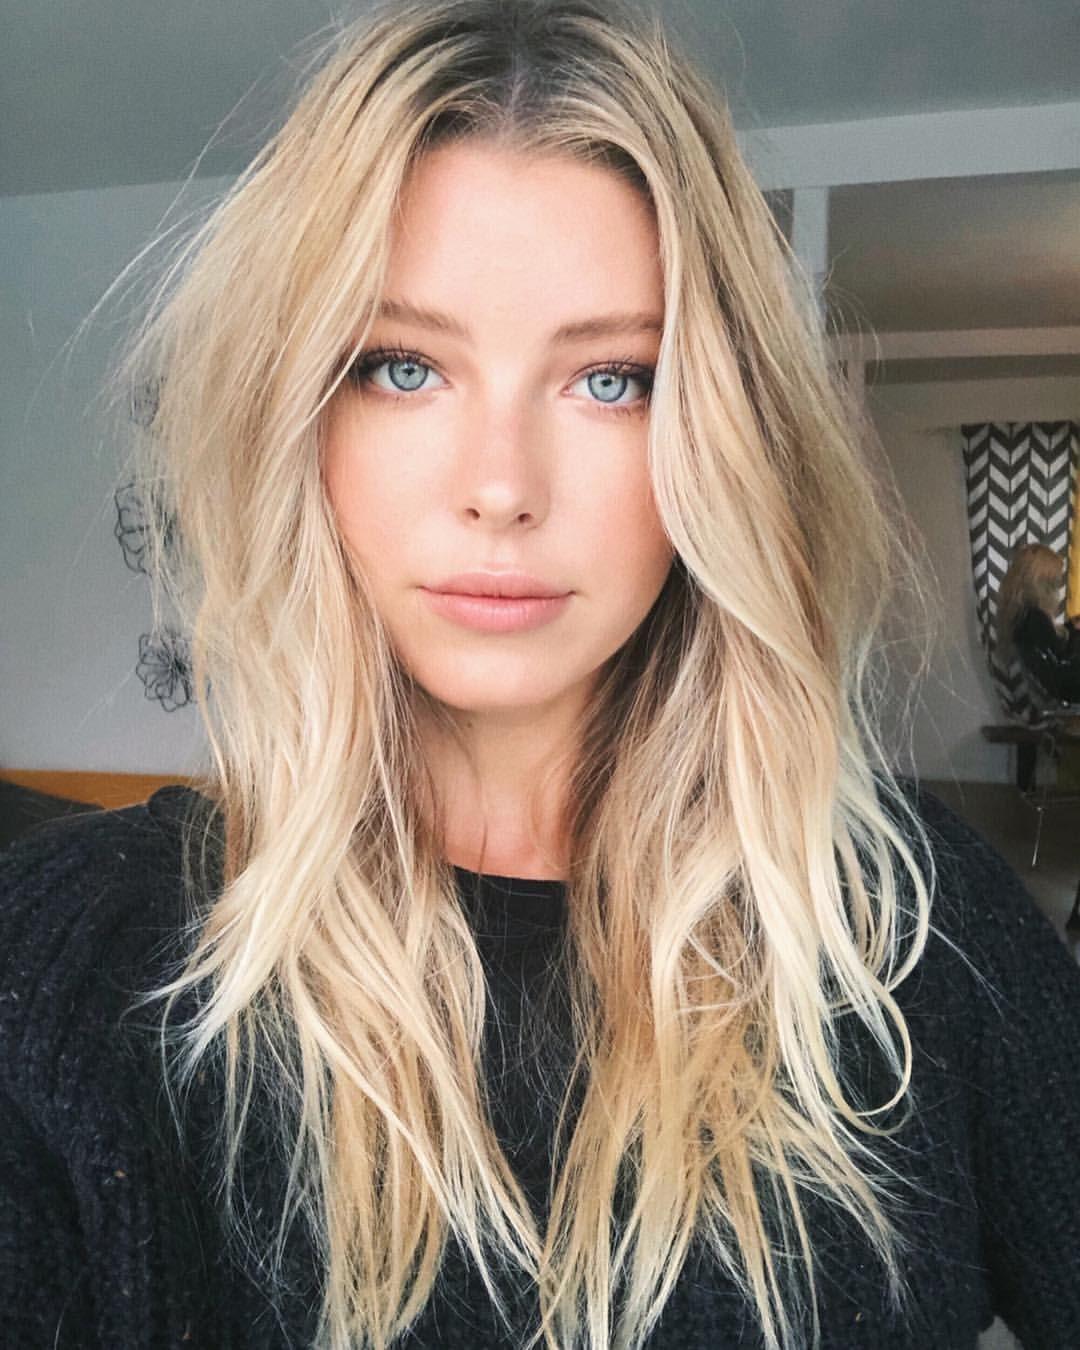 Messy Hair Hairstyles Wavy Hair Blonde Blue Eyes Minimal Natural Makeup Beauty Blonde Wavy Hair Blonde Hair Blue Eyes Messy Blonde Hair